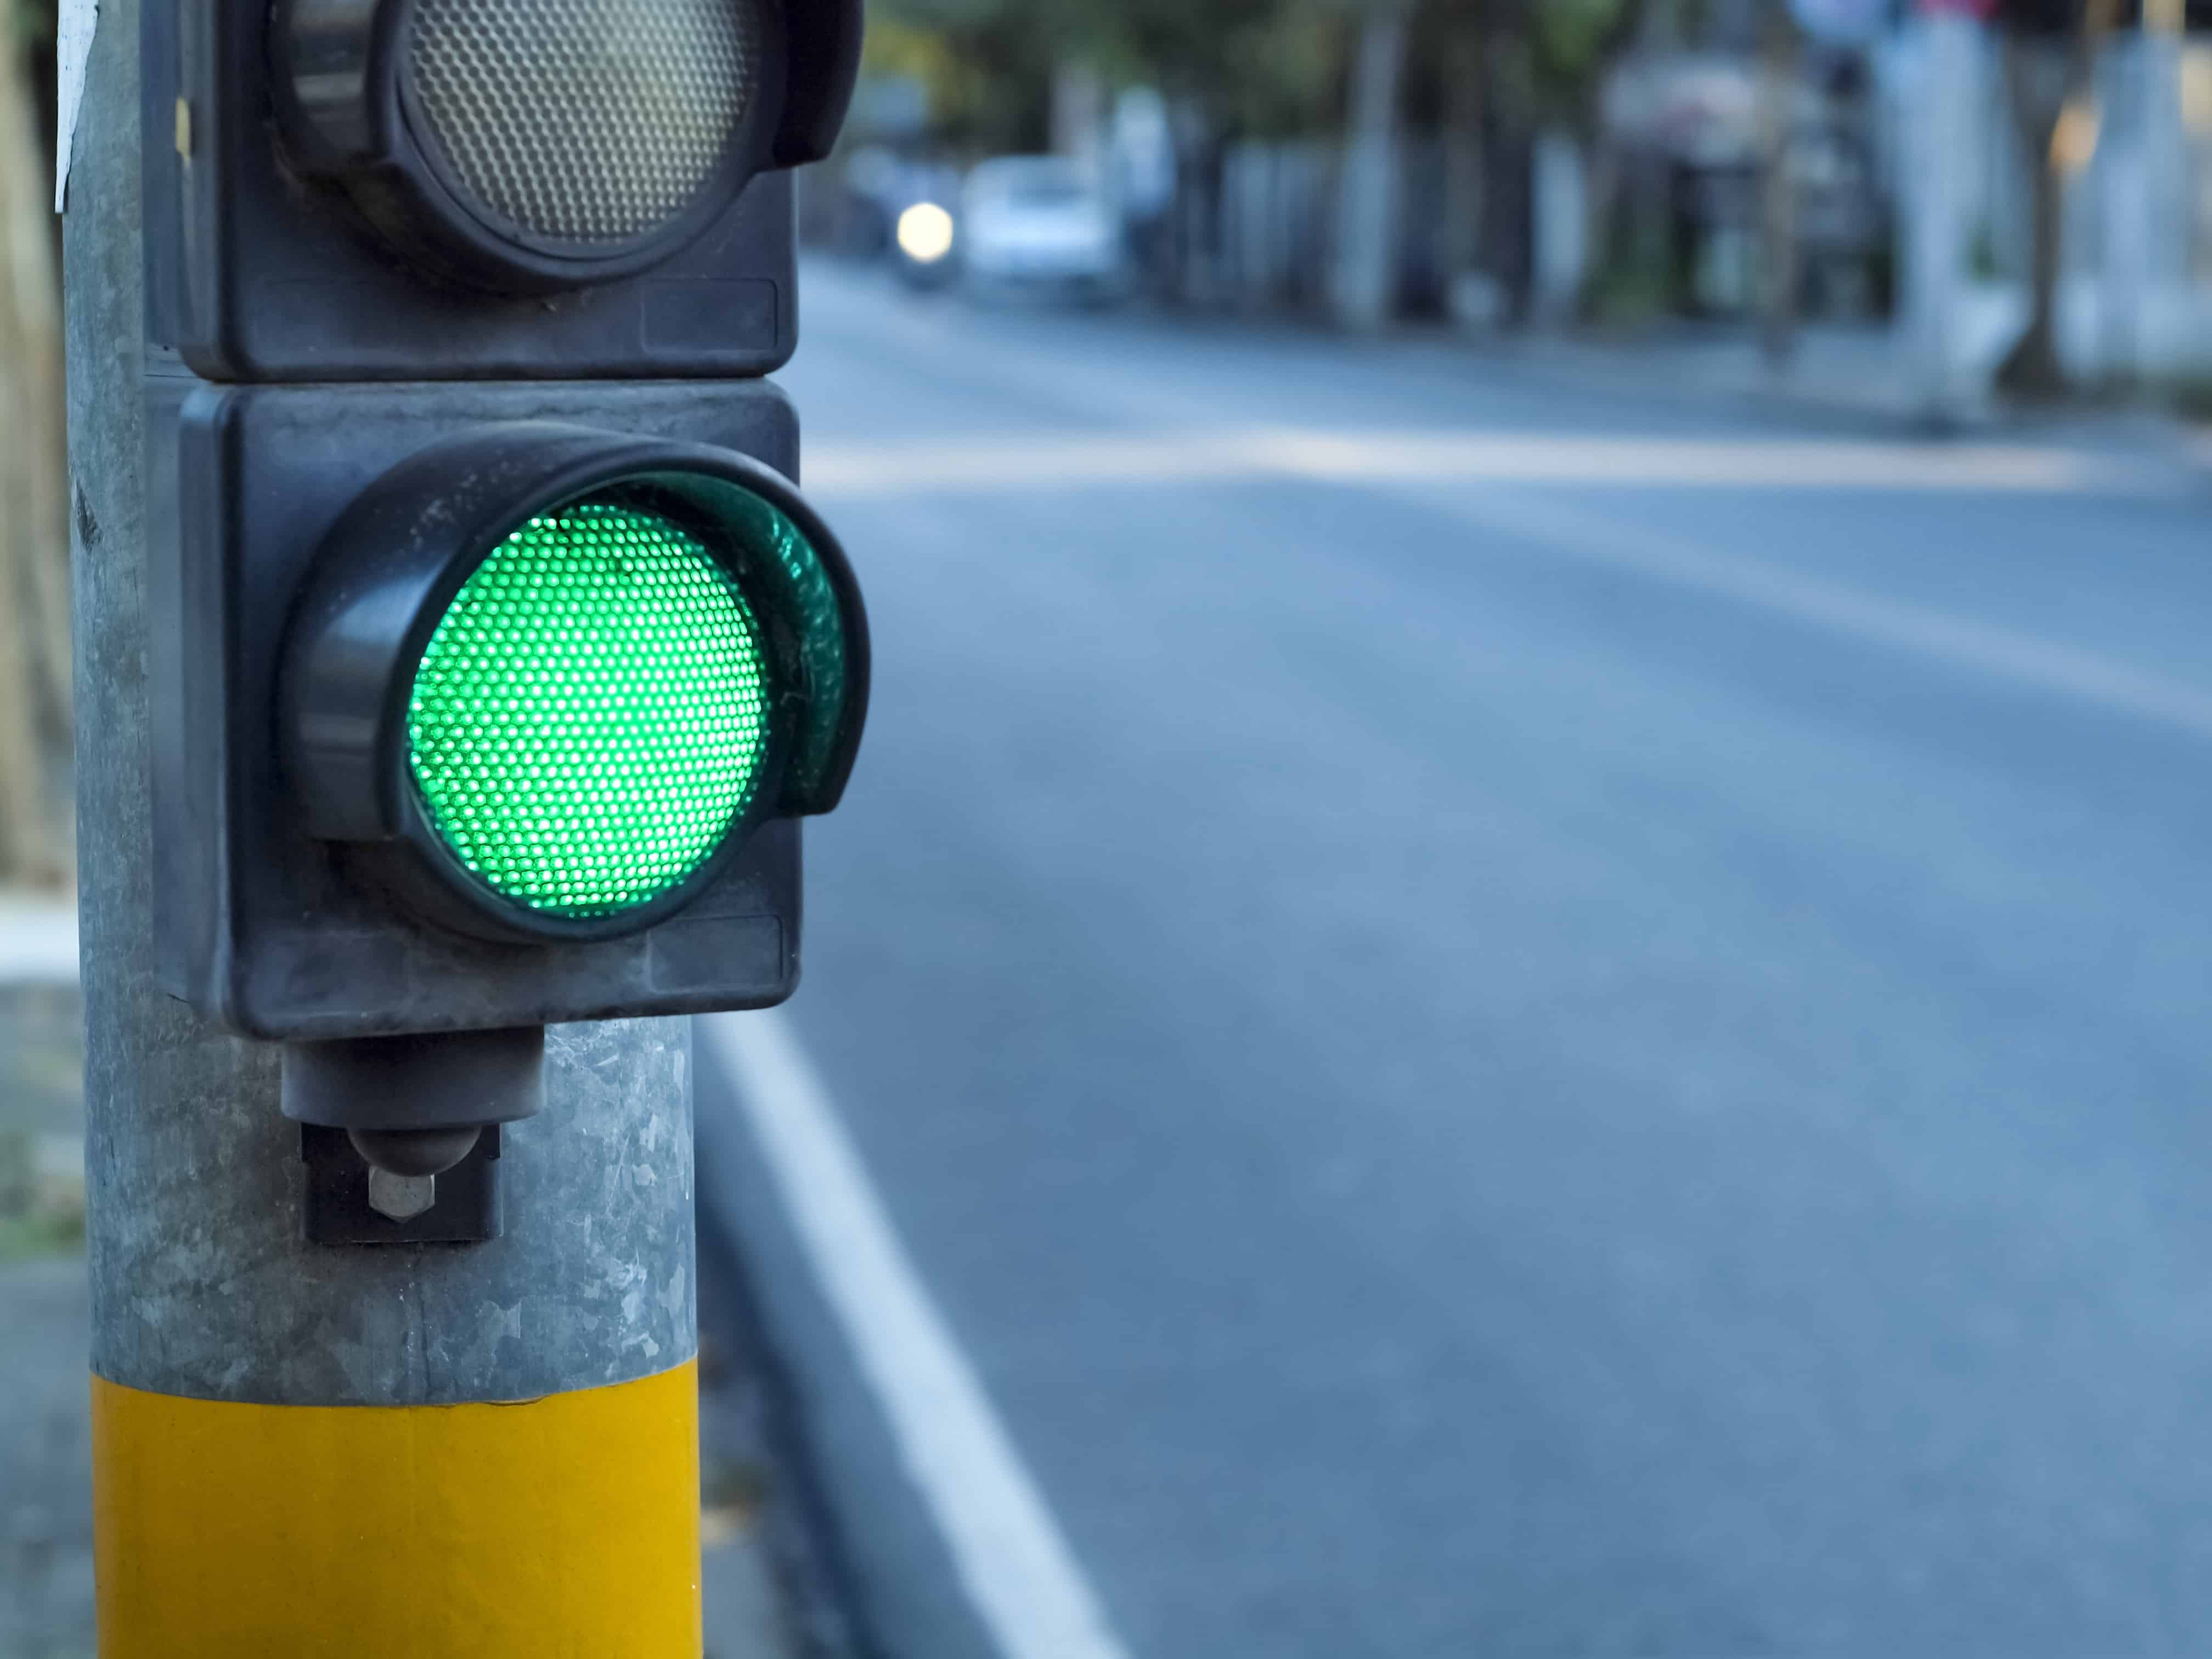 Woman Dies in Tully Road Hit-and-Run Crash [San Jose, CA]